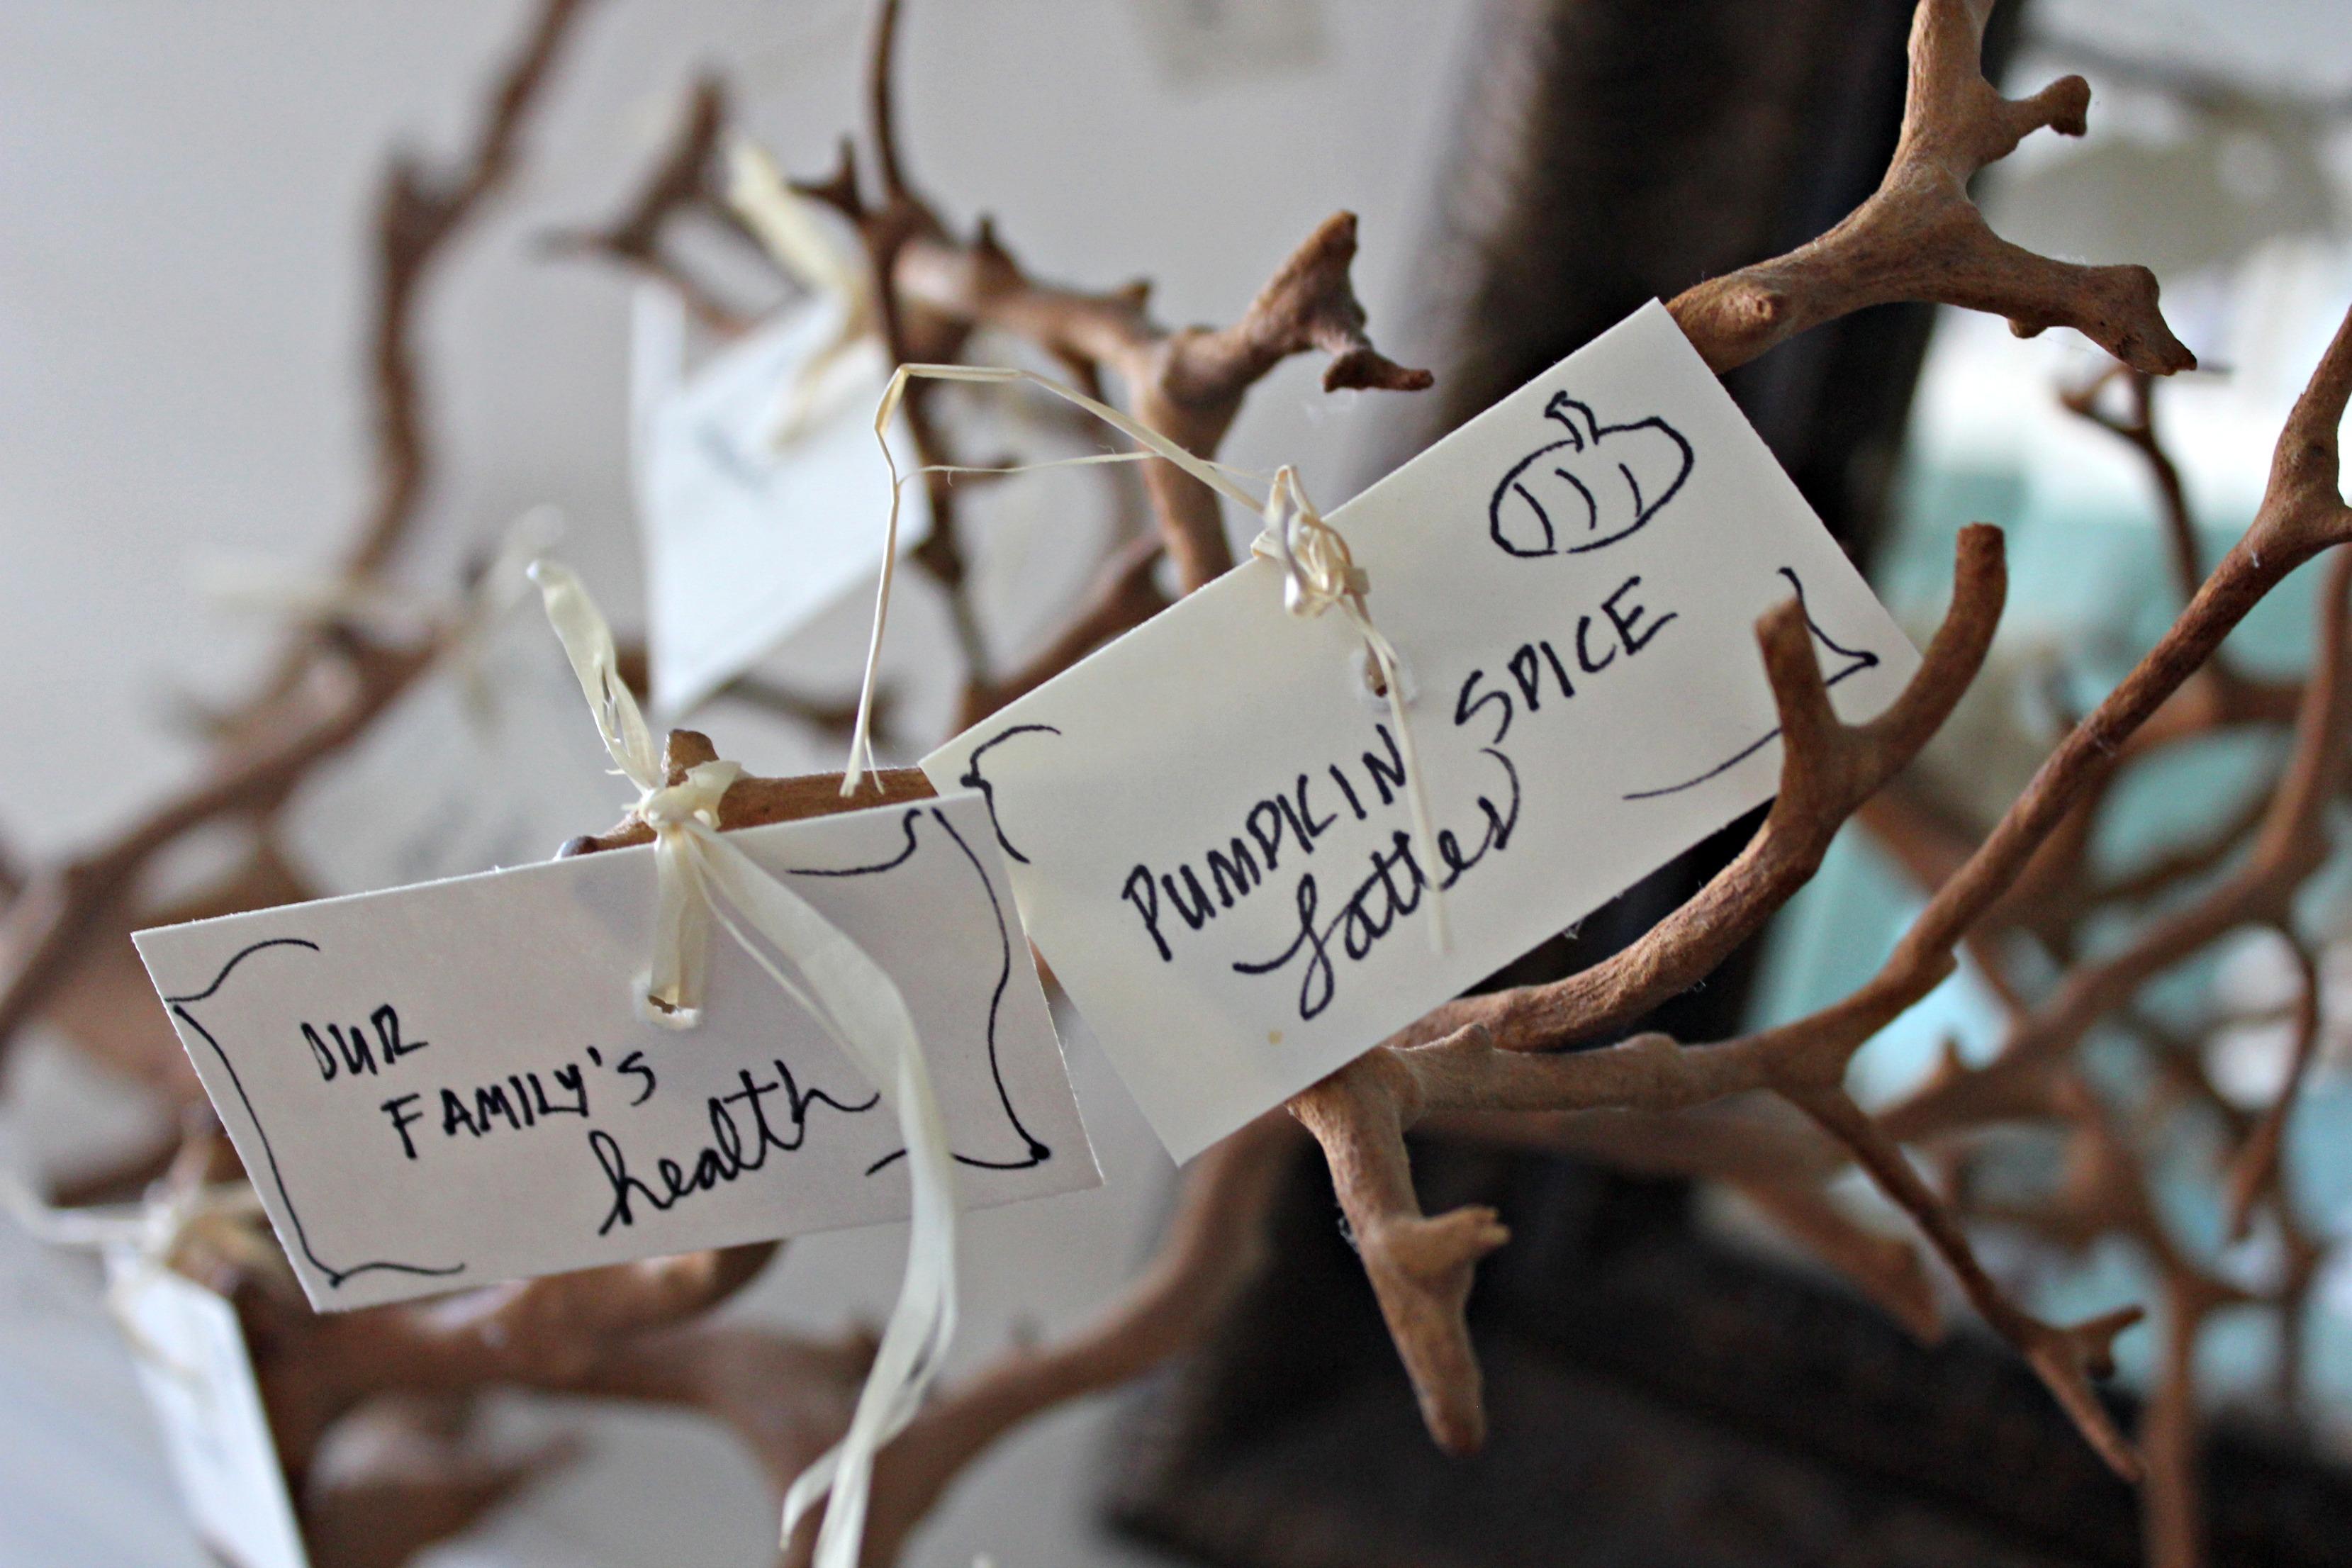 DIY Gratitude Tree Tutorial SheJustGlows.com